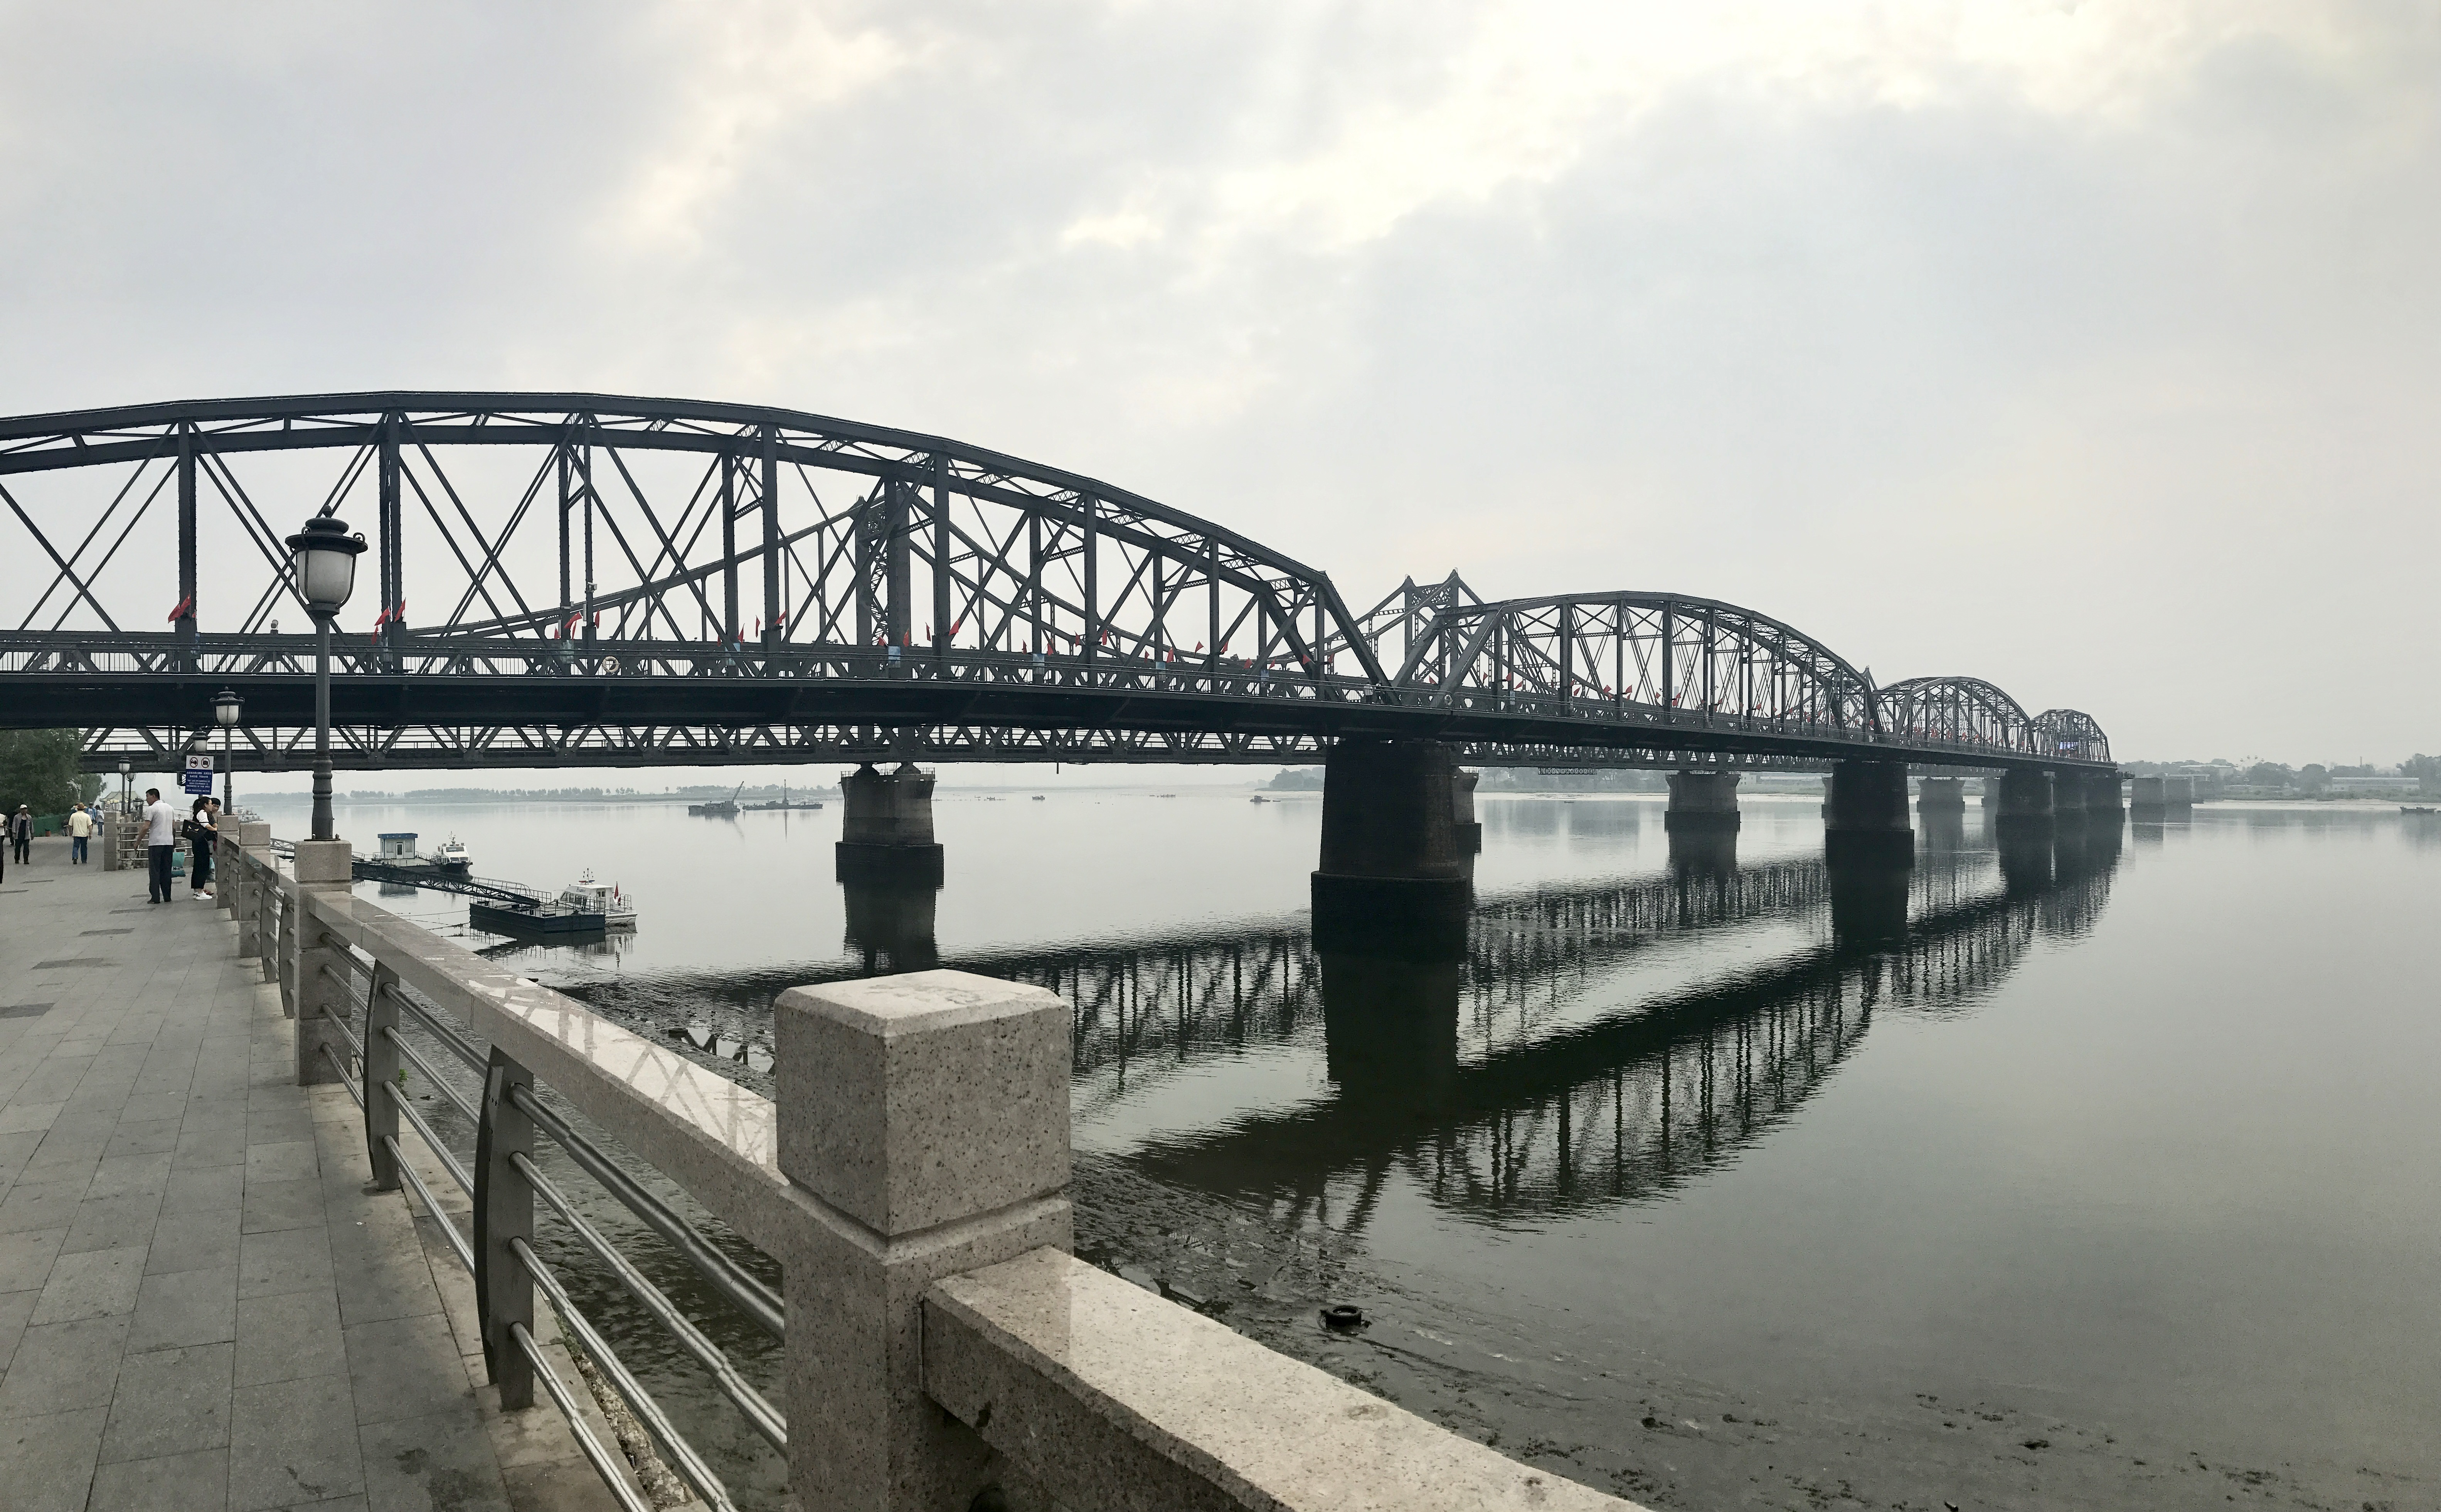 dprk_dandong_sino-korean_friendship_bridge.jpg